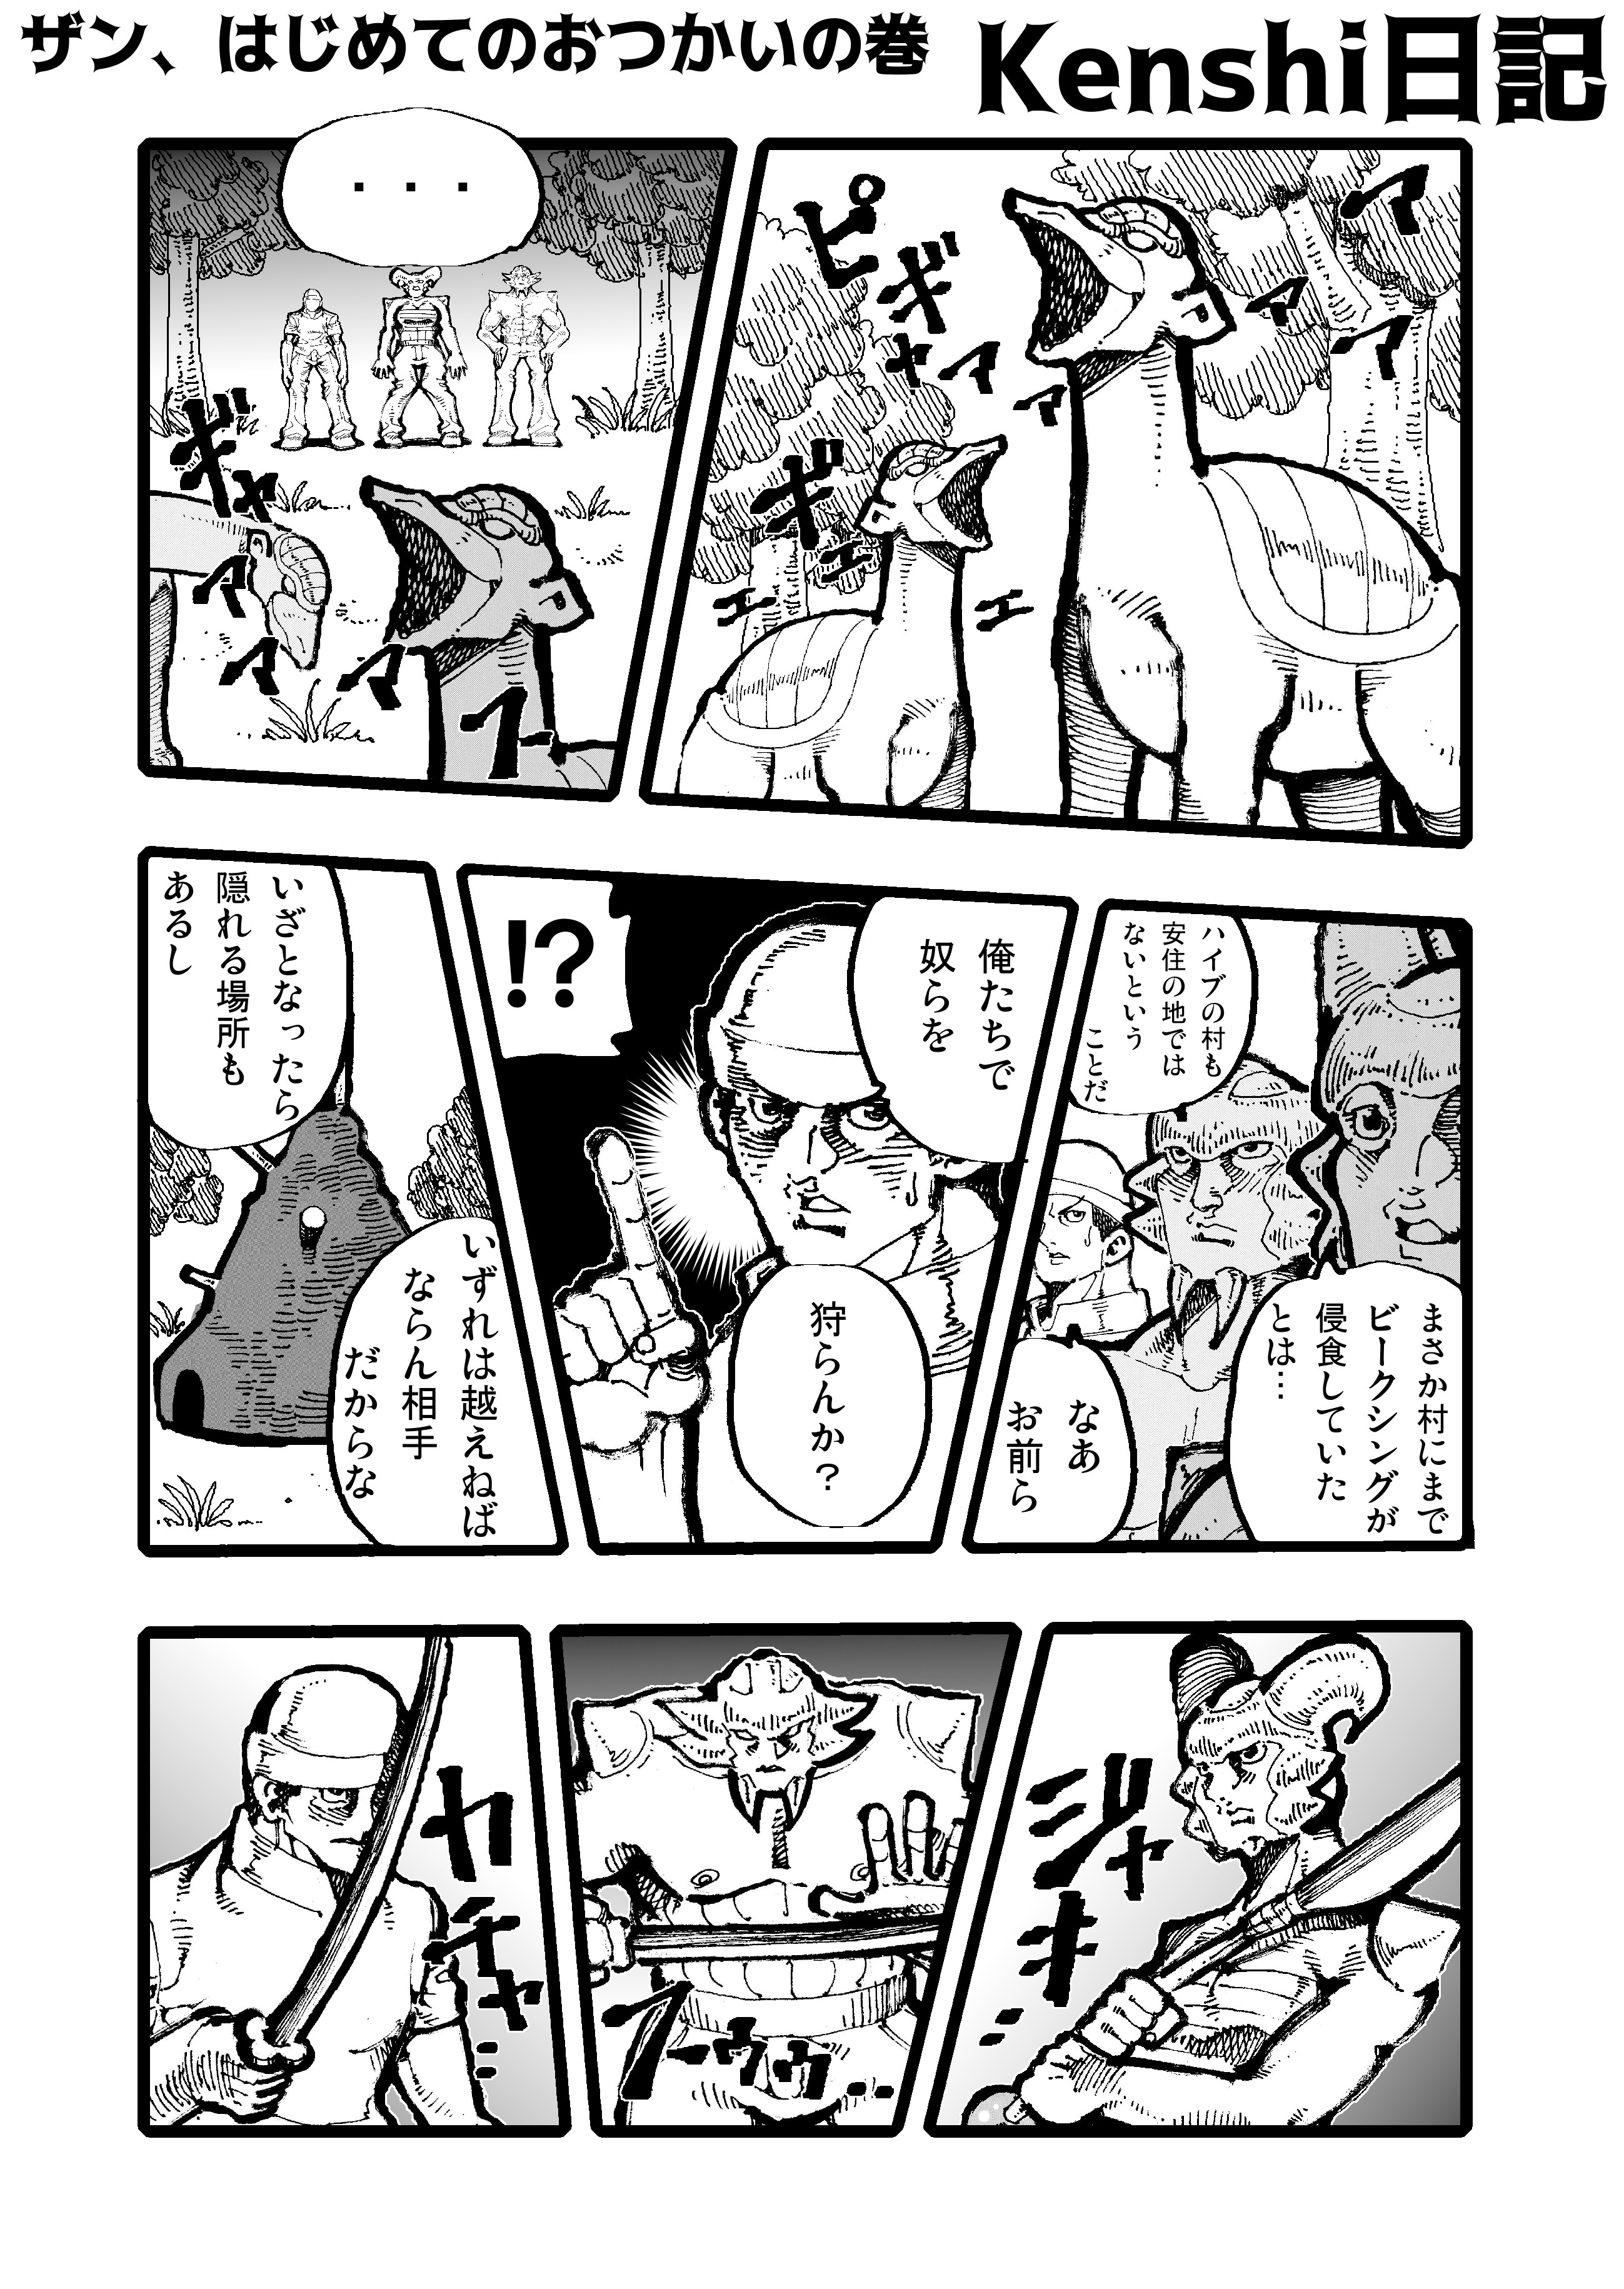 Kenshi日記25 ザン、はじめてのおつかいの巻